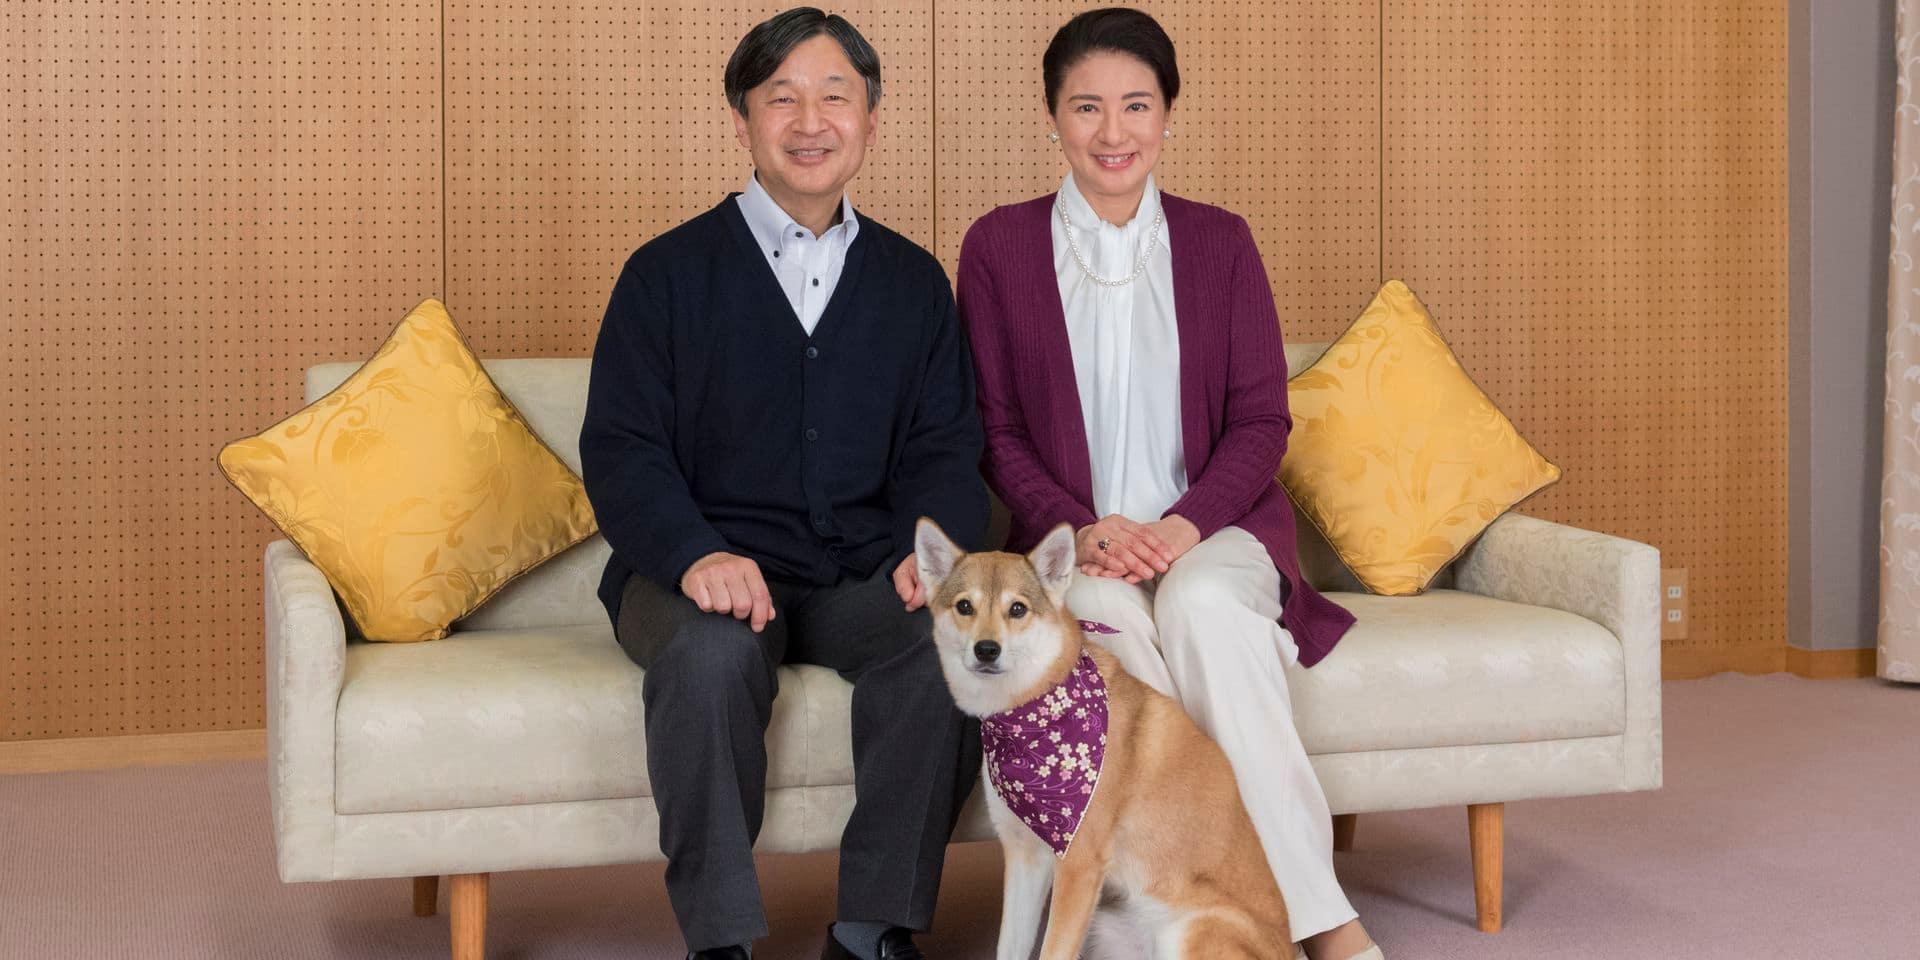 Le dernier anniversaire de la princesse Masako